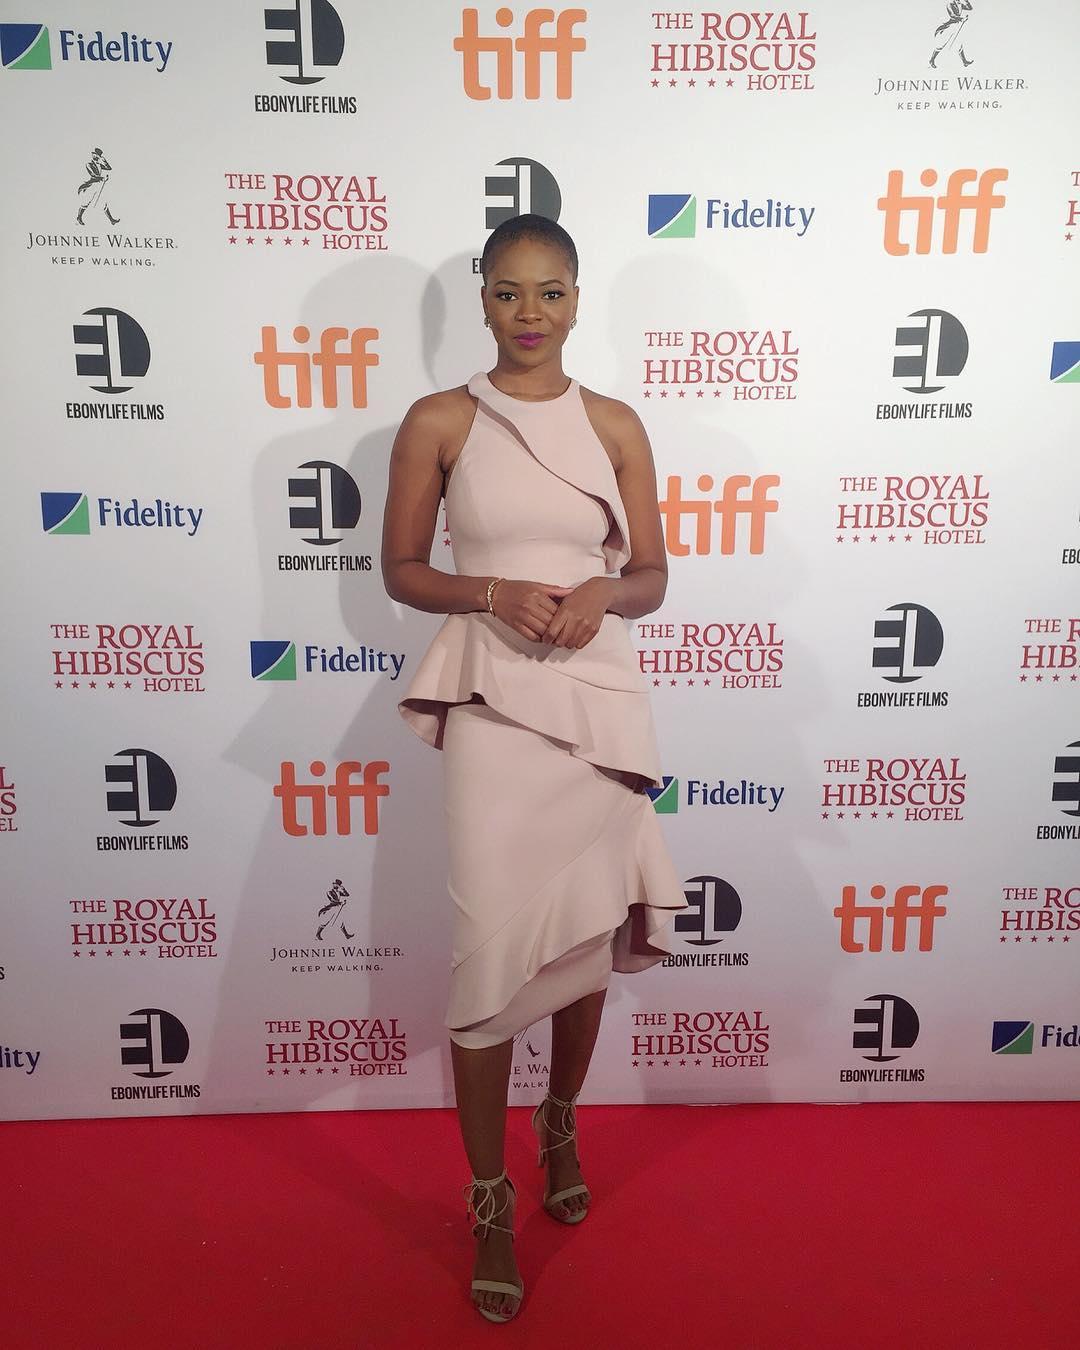 Zainab Balogun Short Hair Royal Hibiscus Screening TIFF 2018